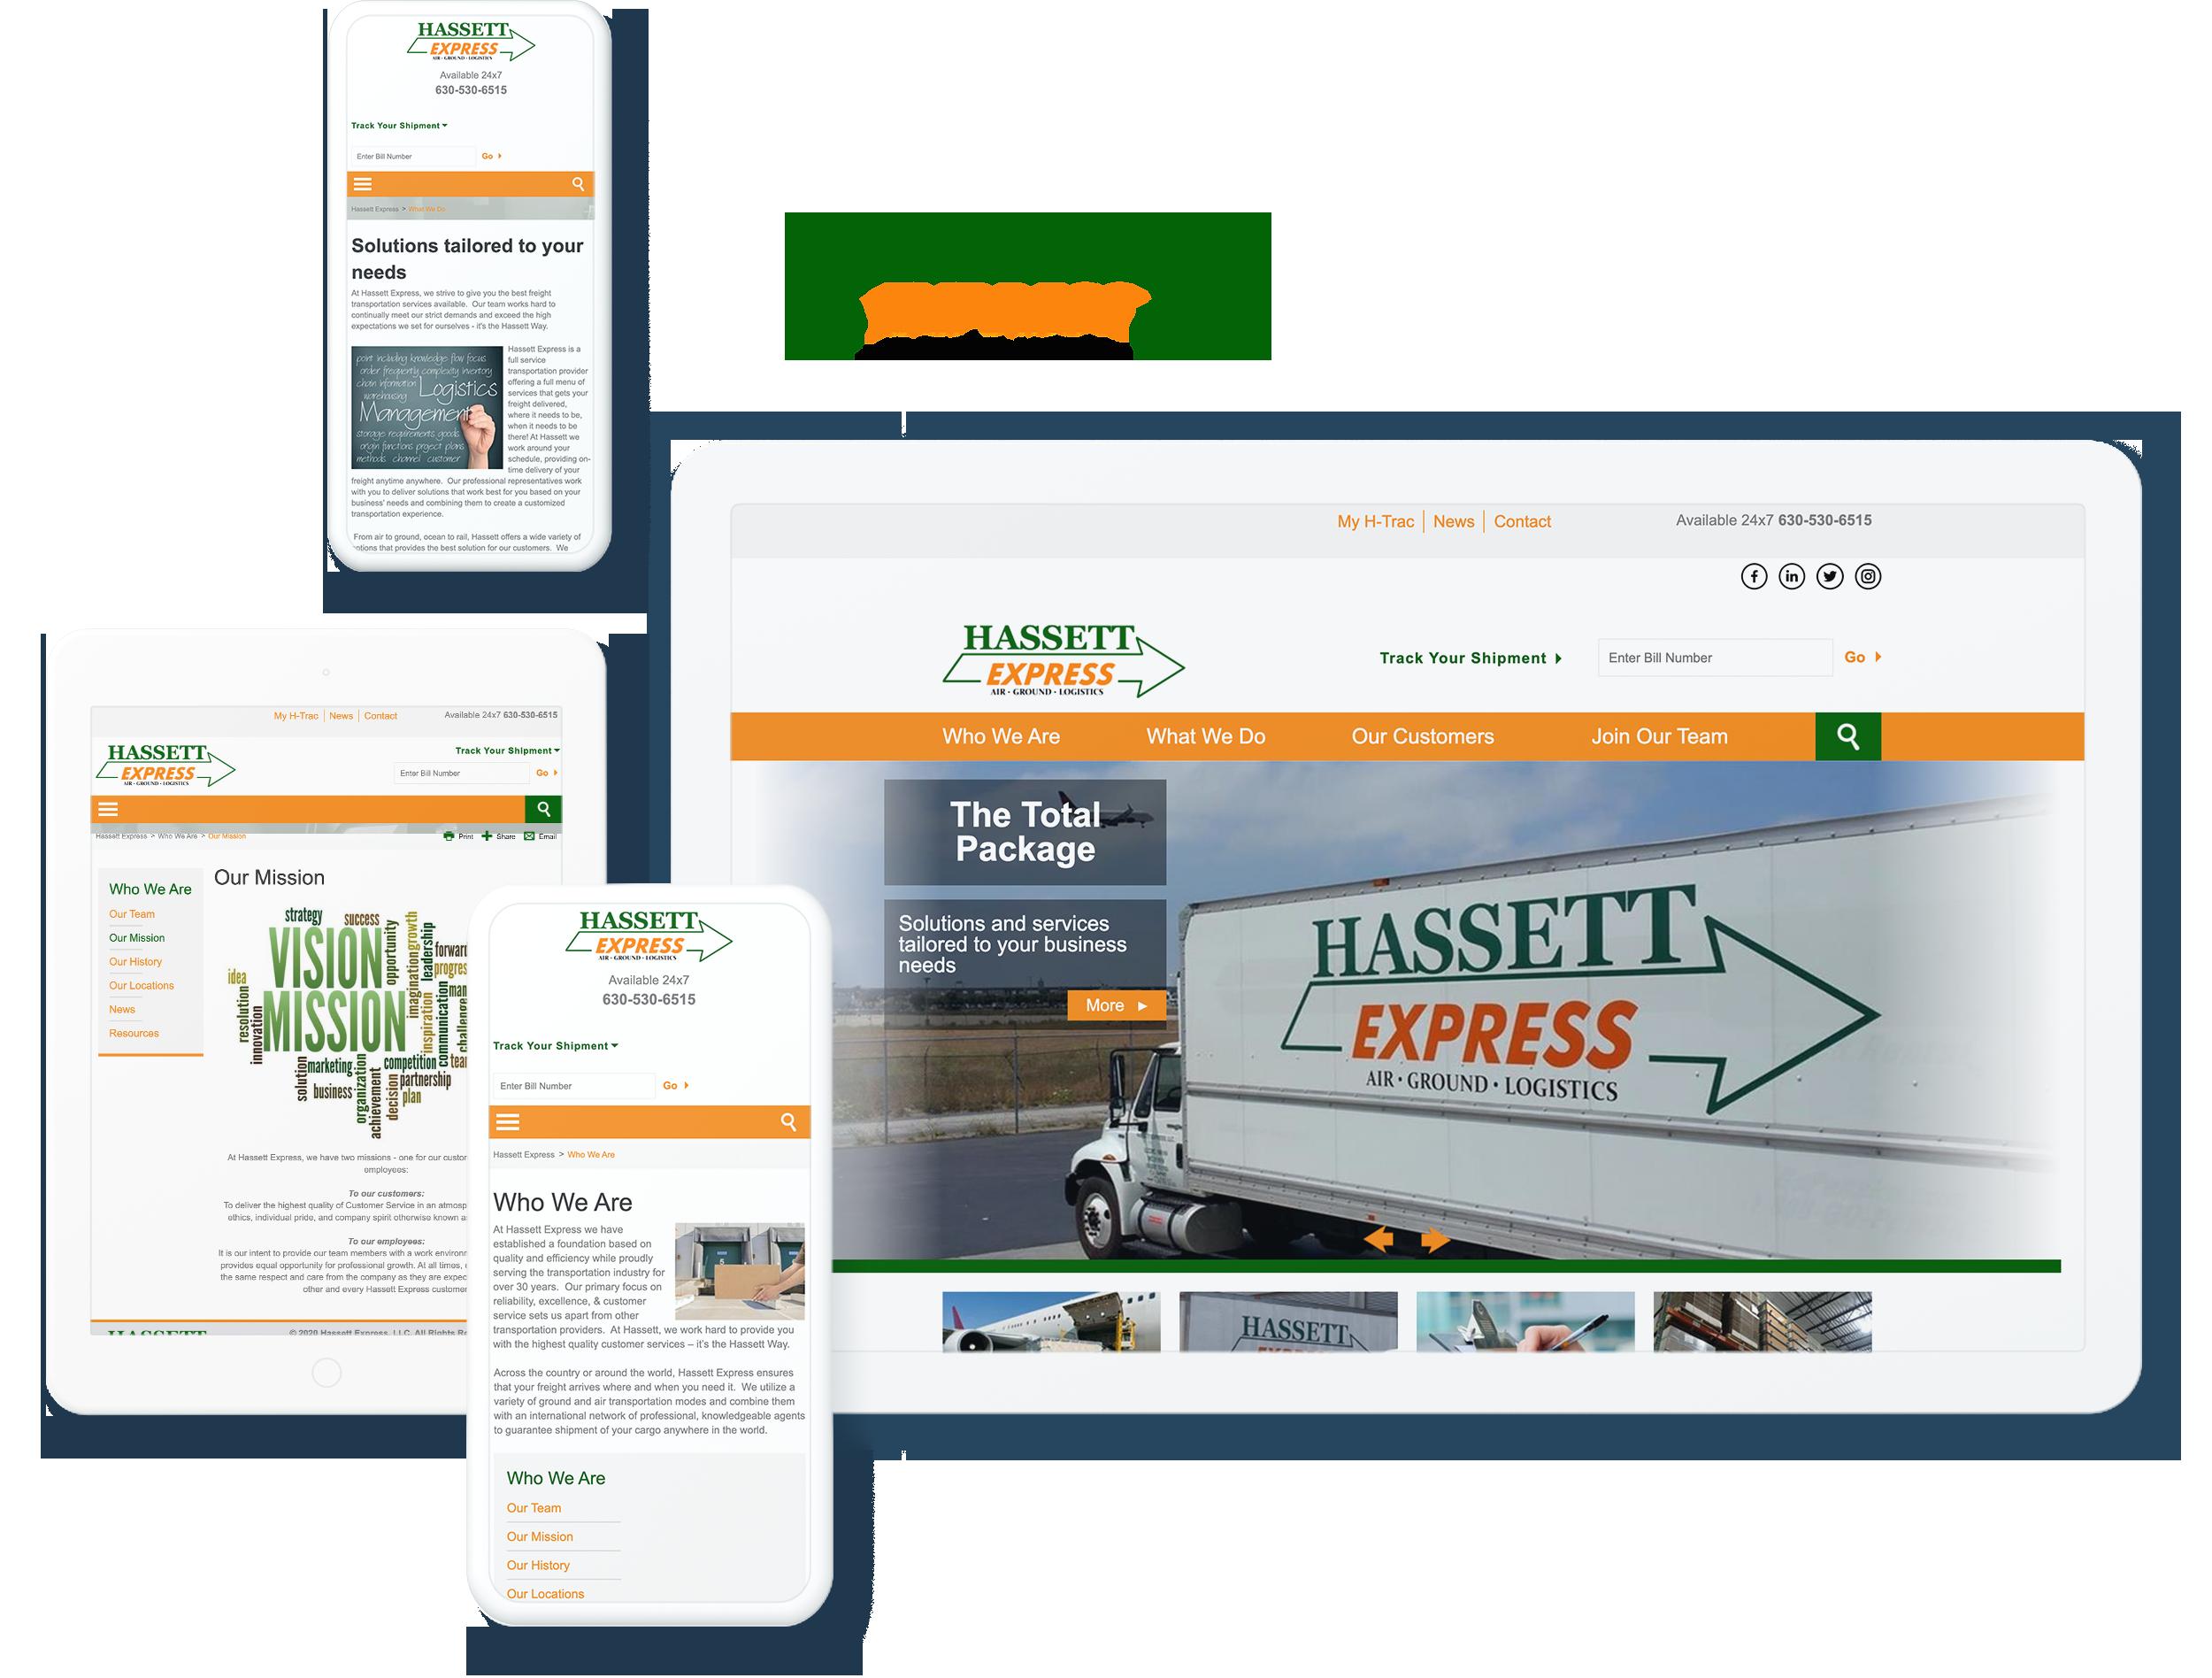 Hasset_Express_Spotlight